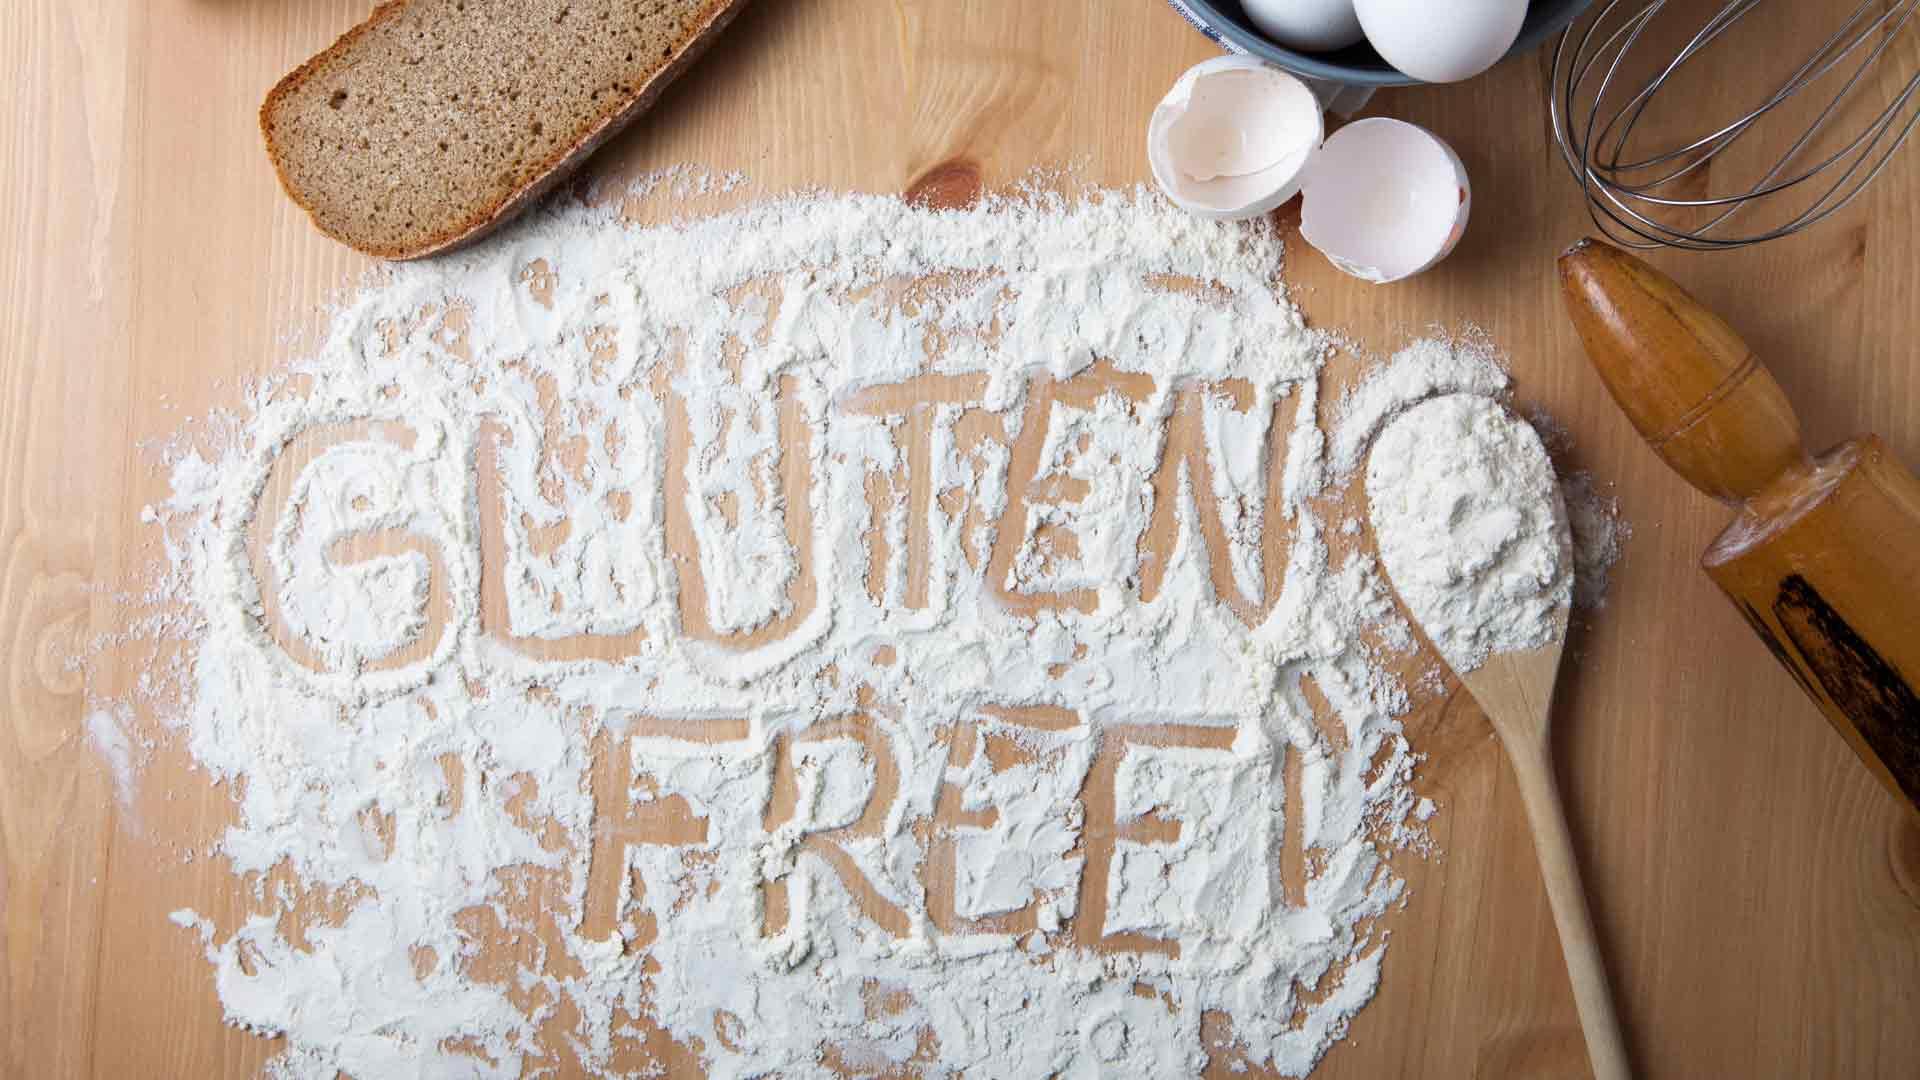 The words Gluten Free written in flour on a wooden table Gluten-free Watchdog